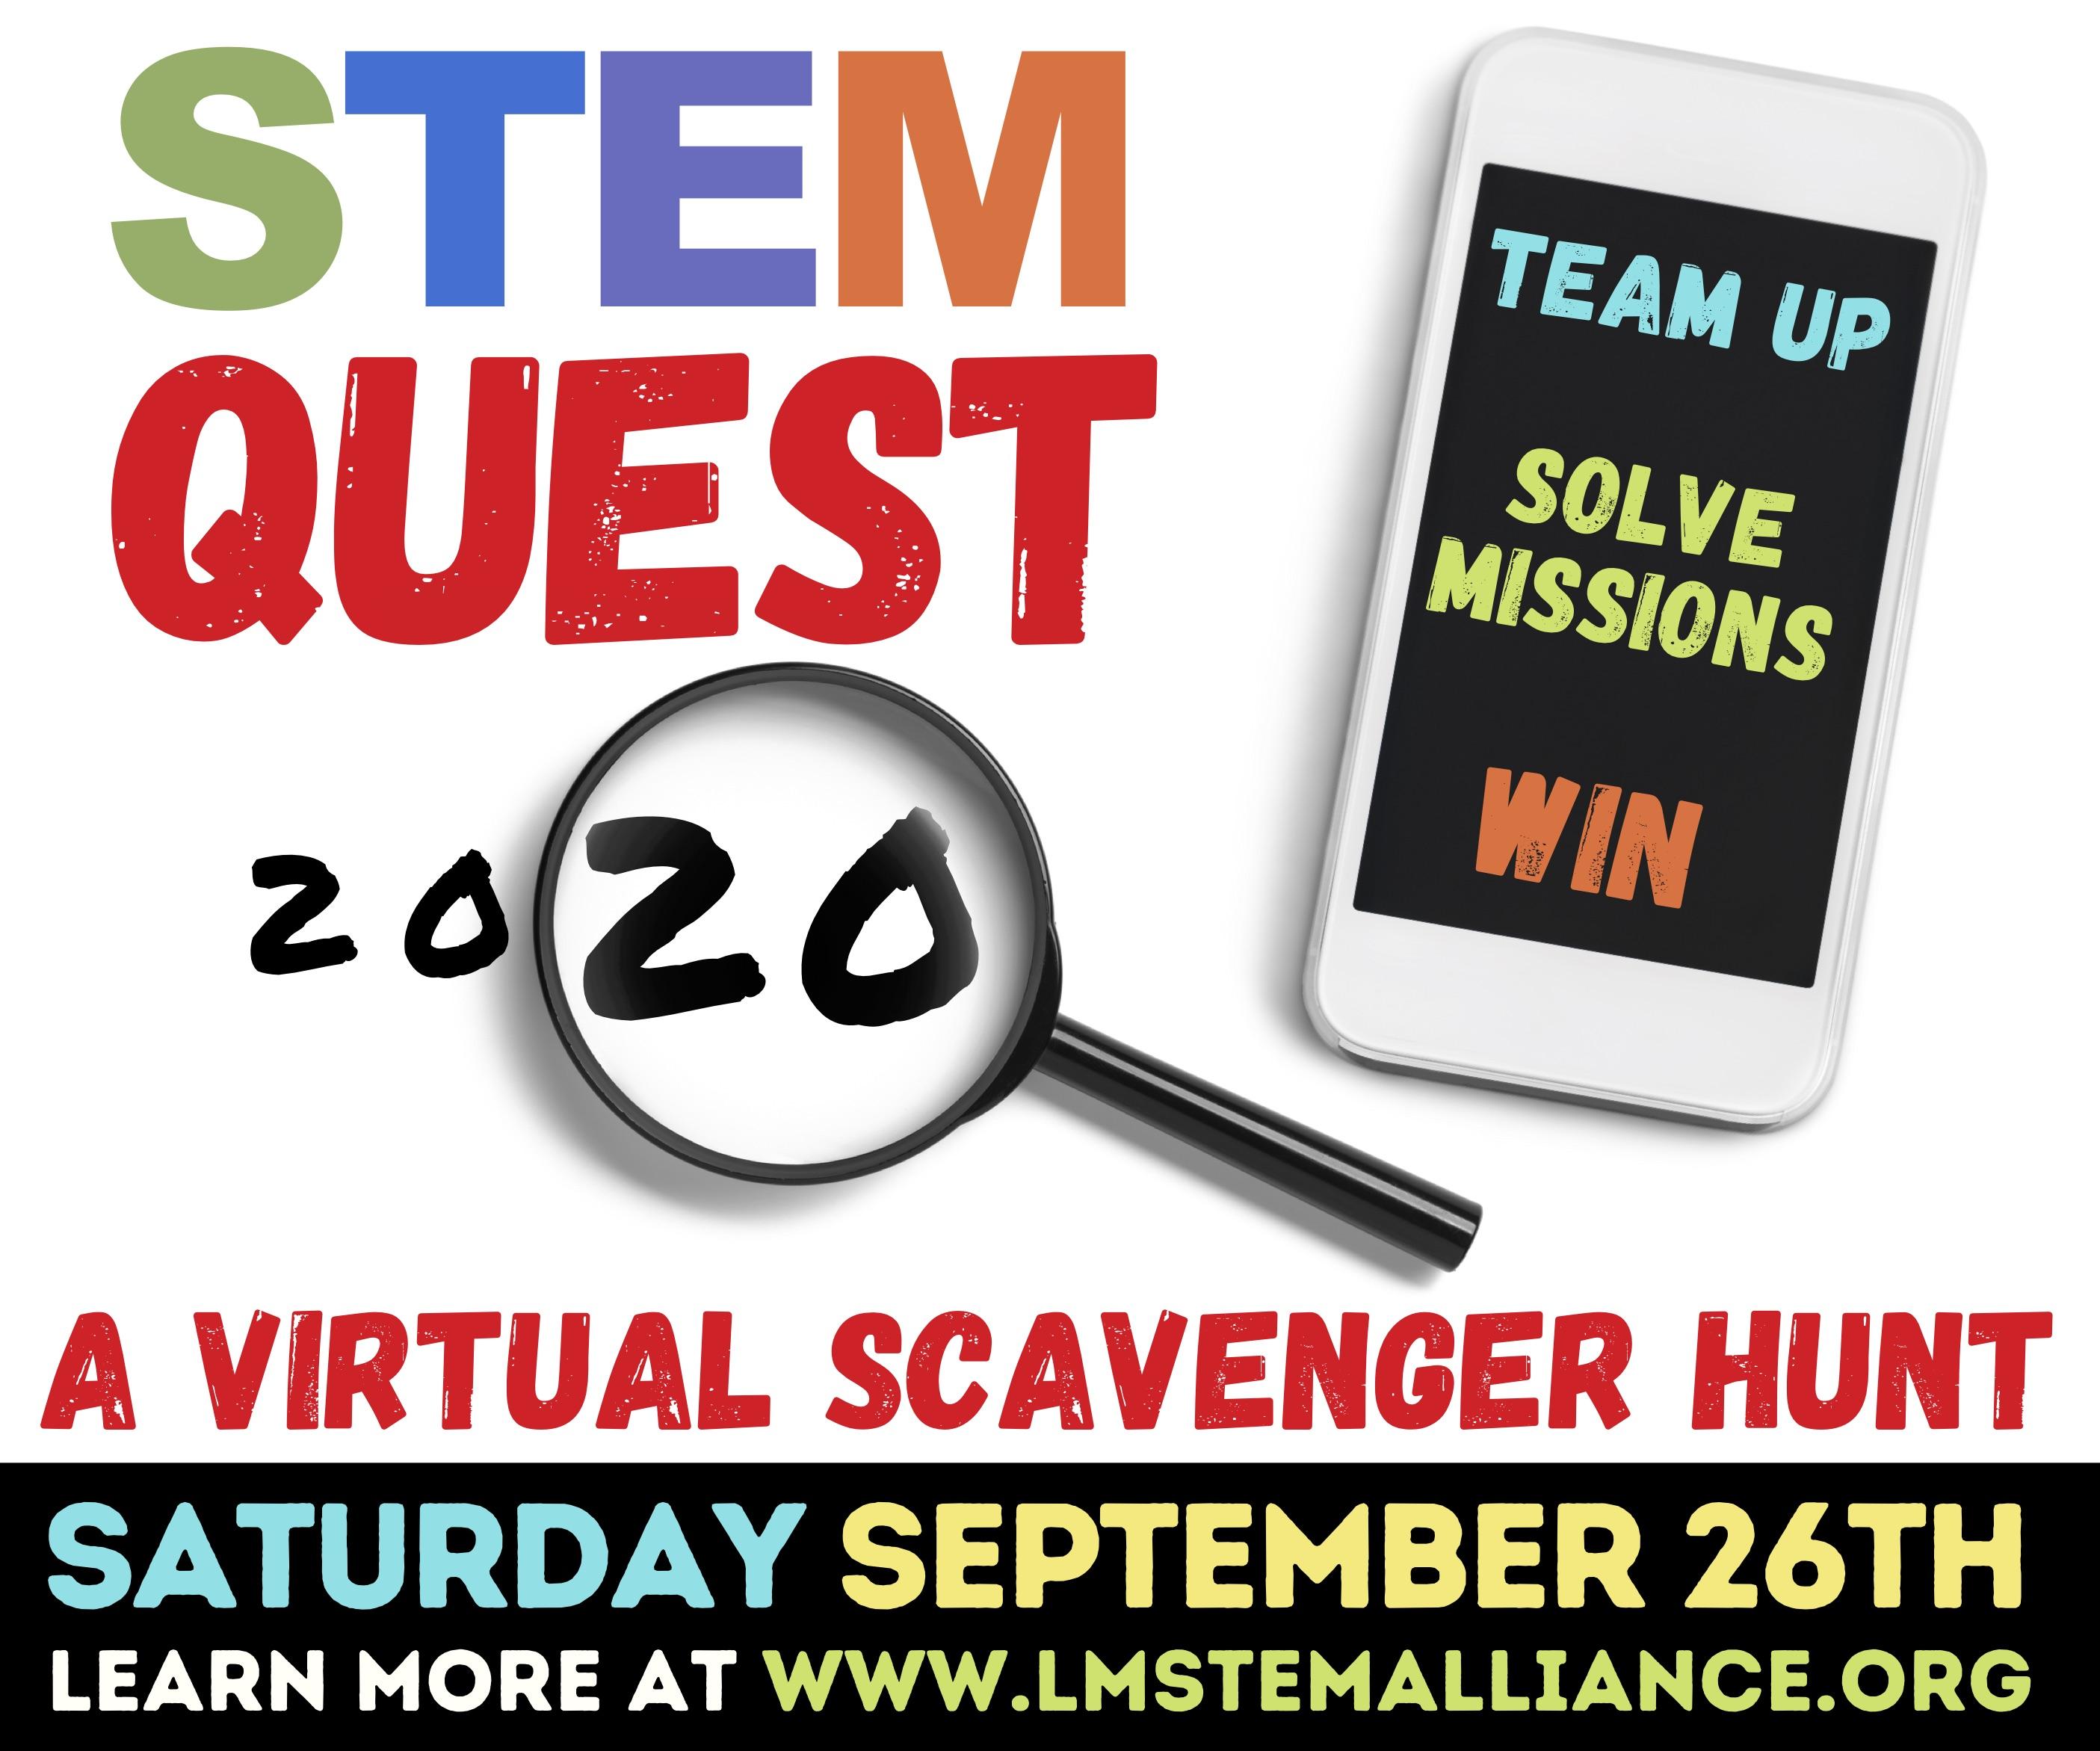 ONLINE STEM Quest 2020 at THE STEM ALLIANCE OF LARCHMONT-MAMARONECK